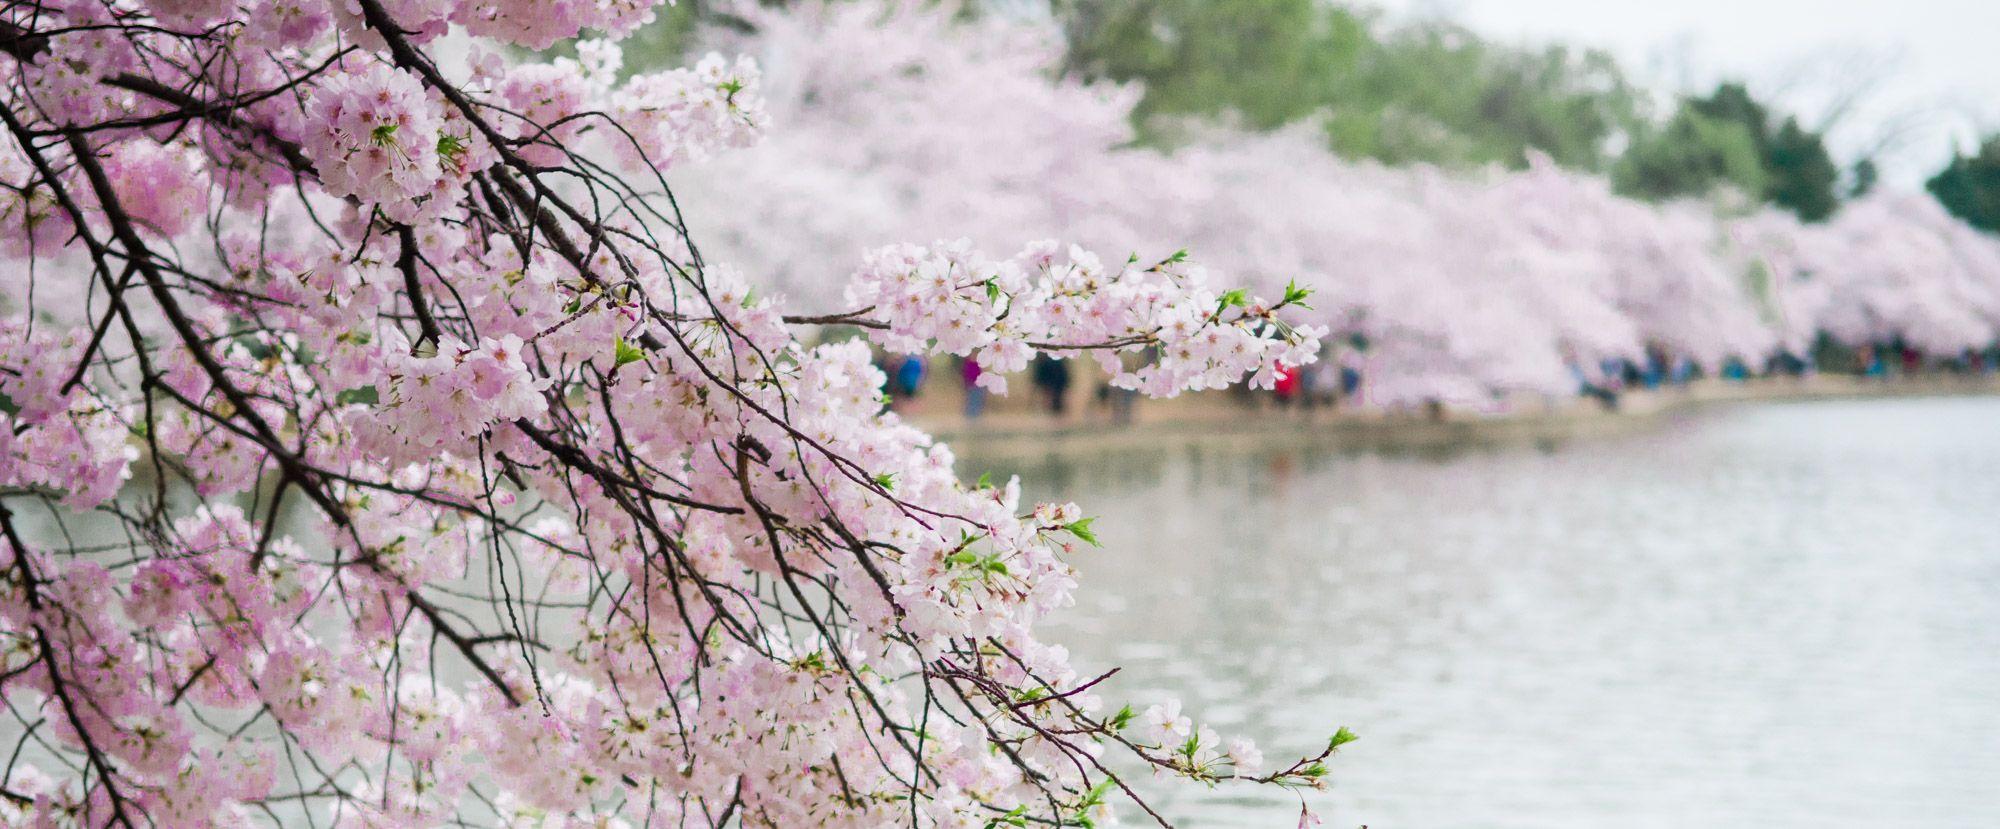 The 2021 Guide To Washington Dc Cherry Blossom Peak Bloom Cherry Blossom Dc Cherry Blossom Festival Blossom Trees